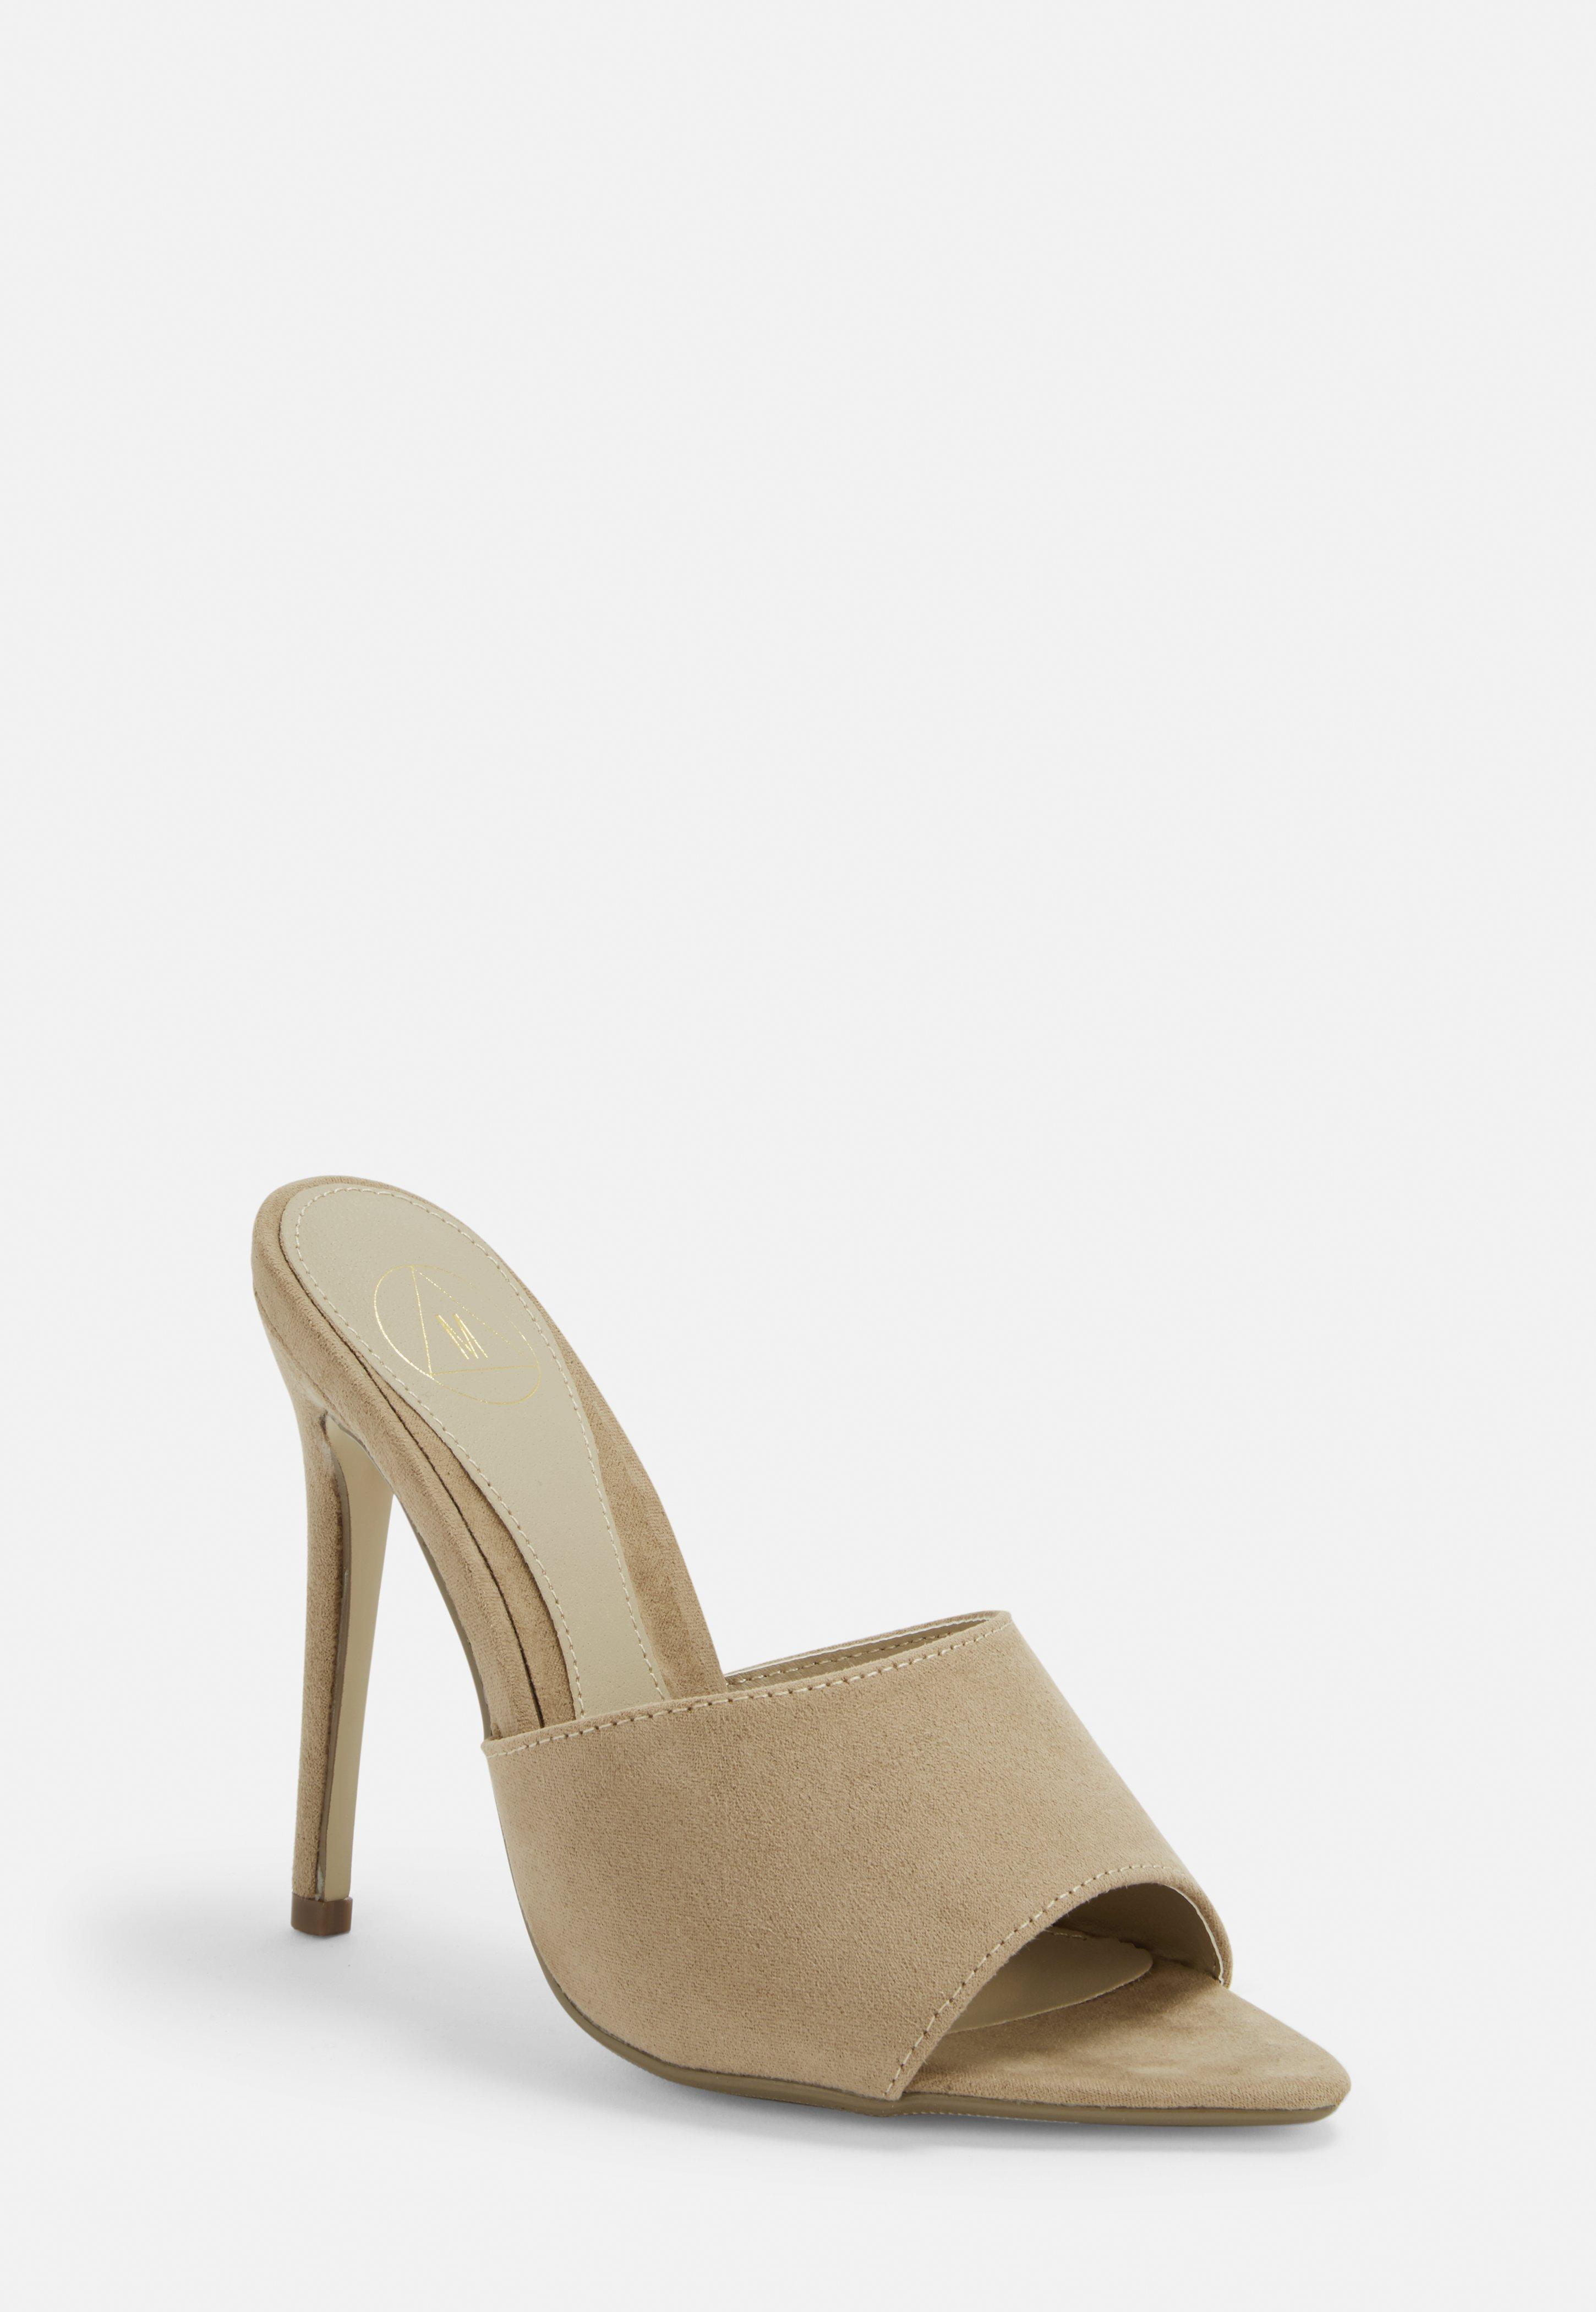 d90c92522 Zapatos